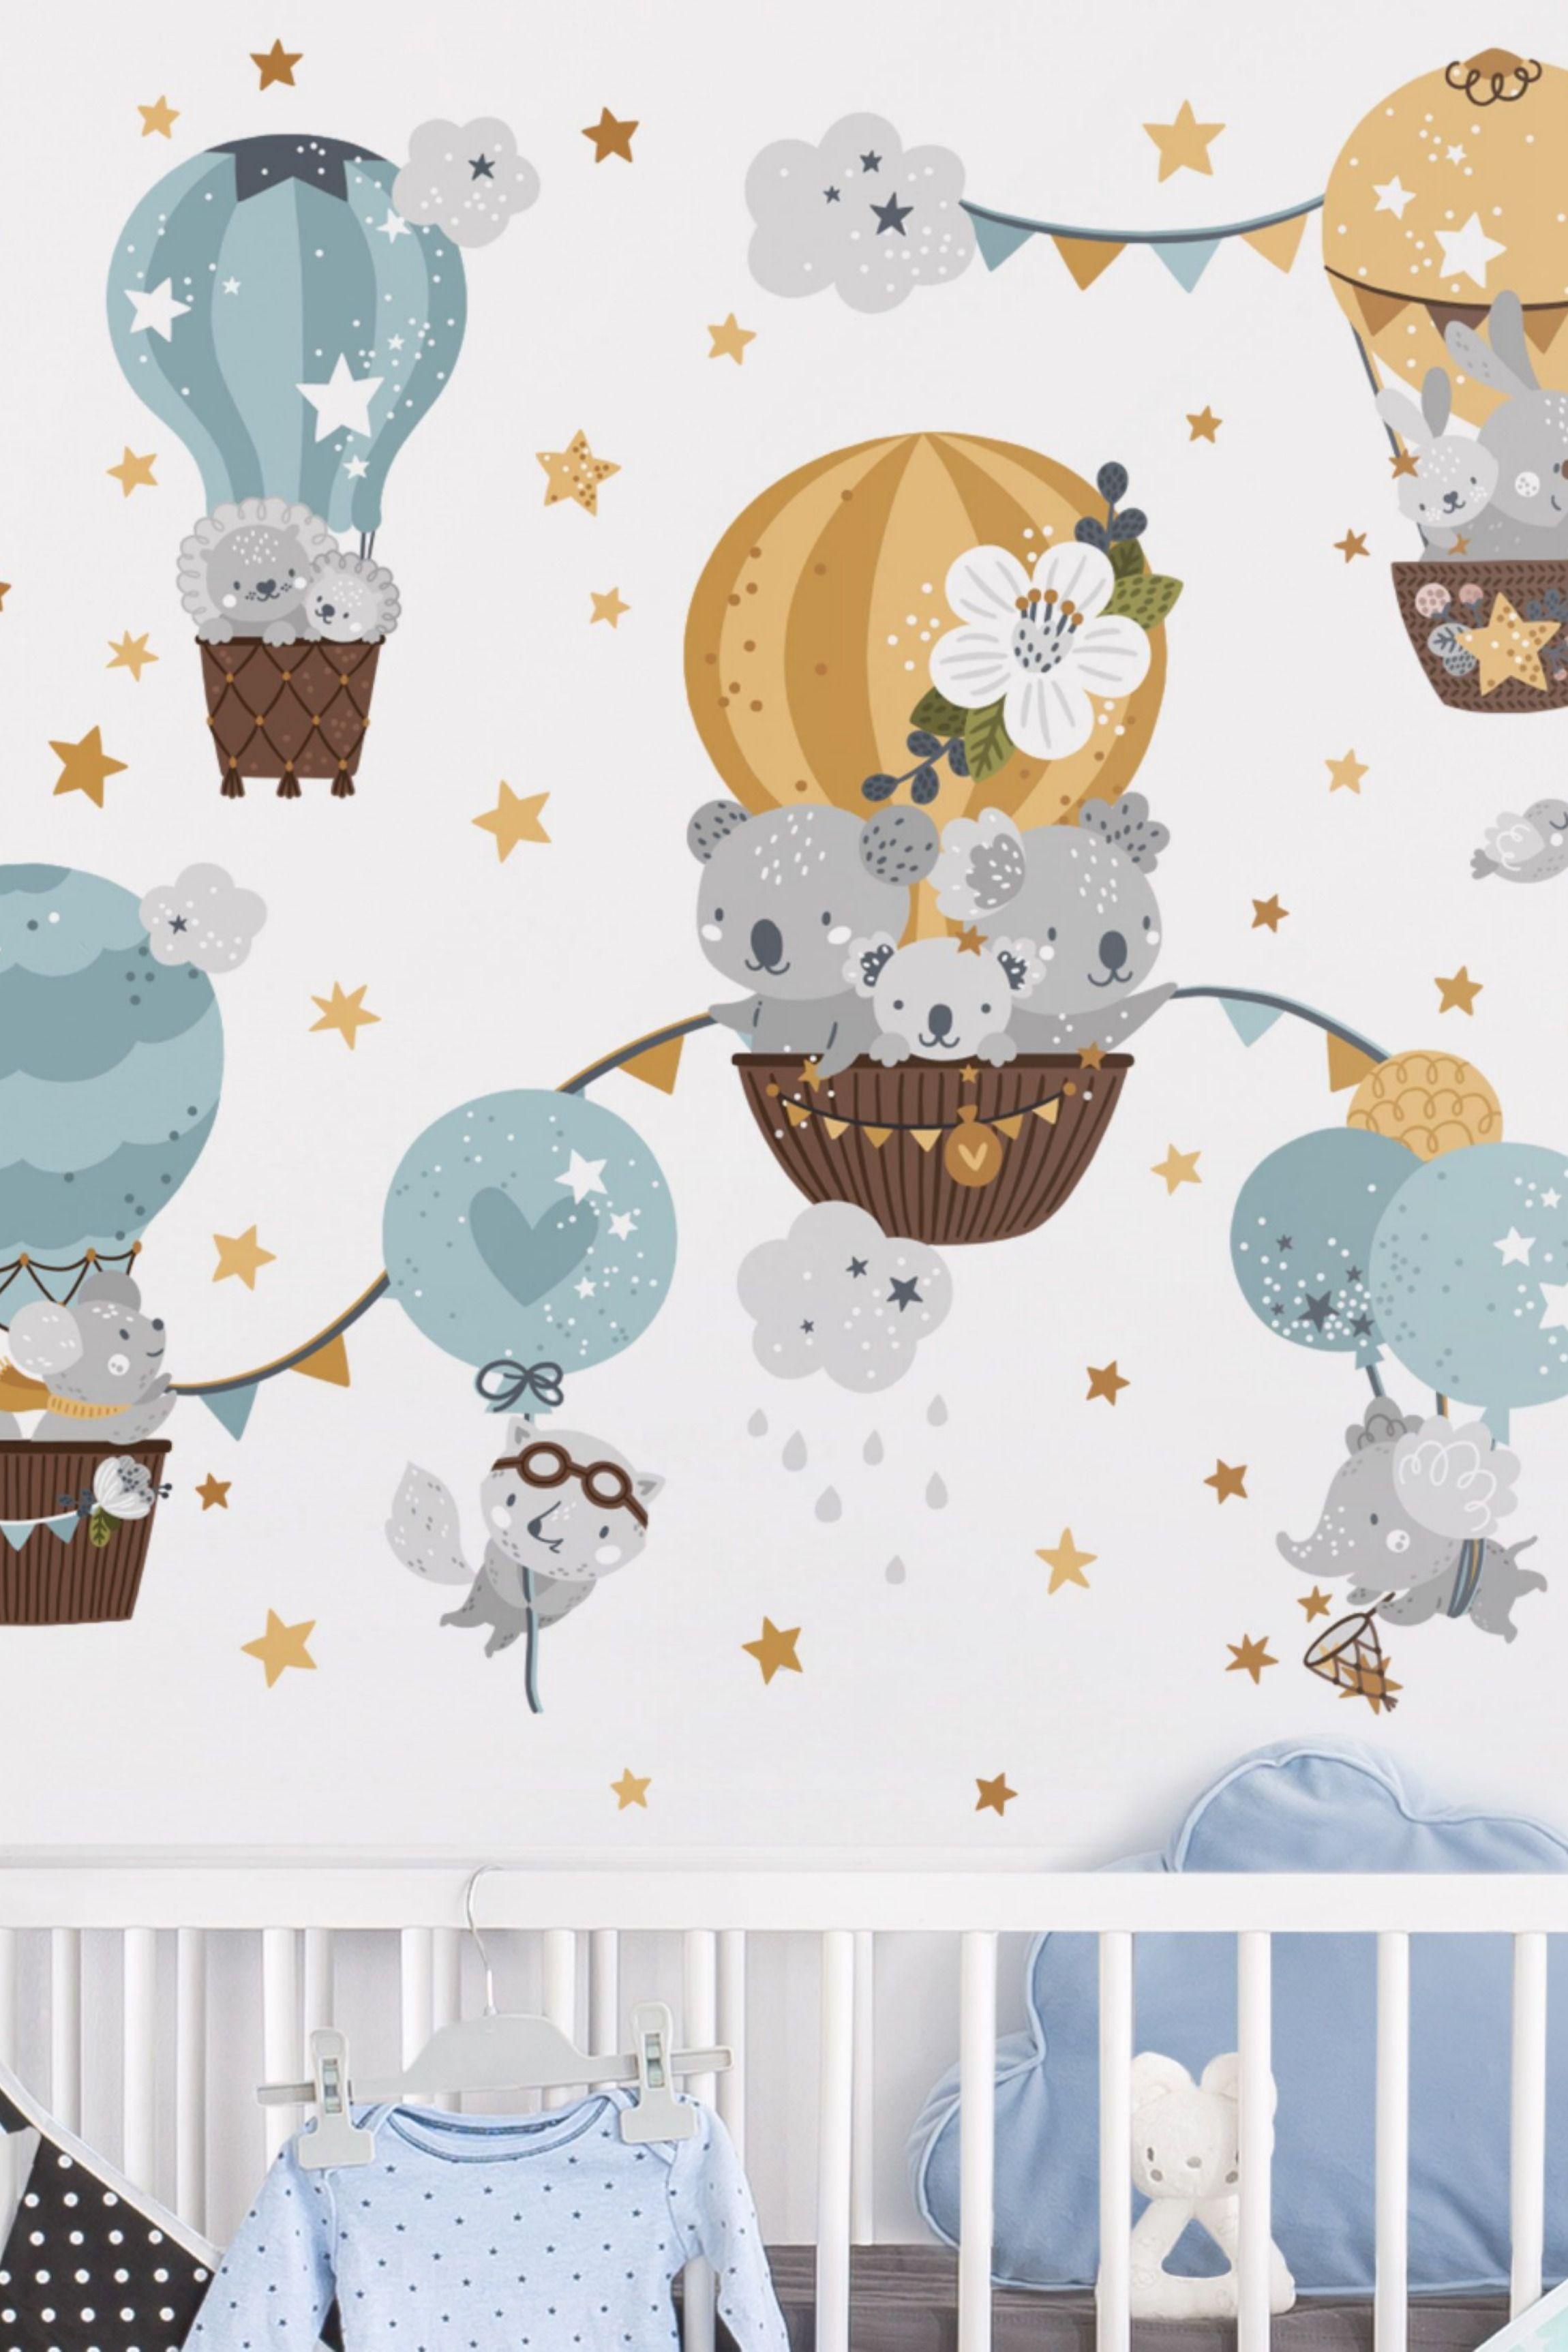 Wandtattoo Pastell Tiere mit Luftballons Wanddeko Set